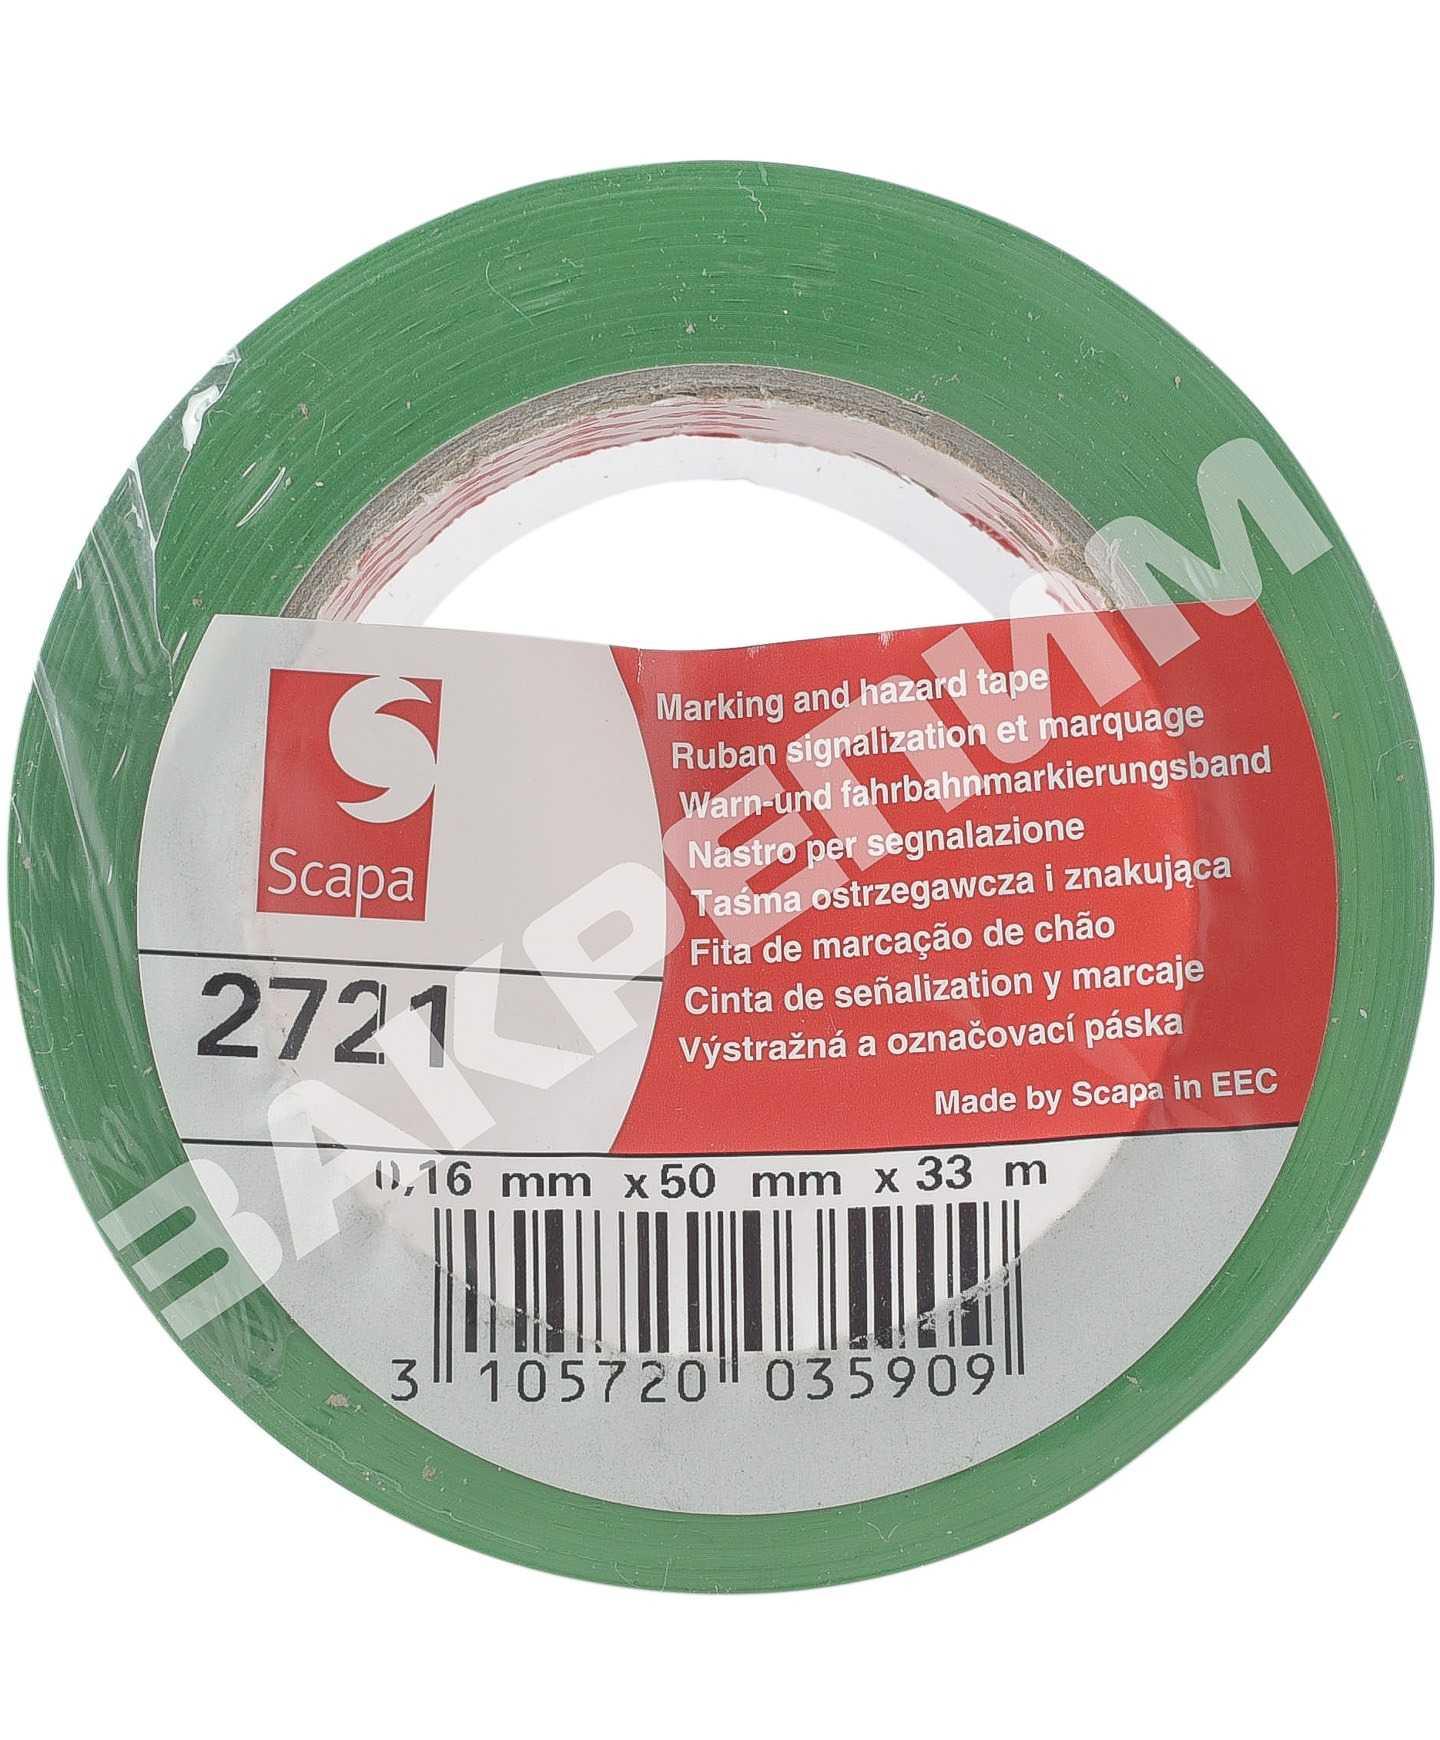 scapa-2721-green